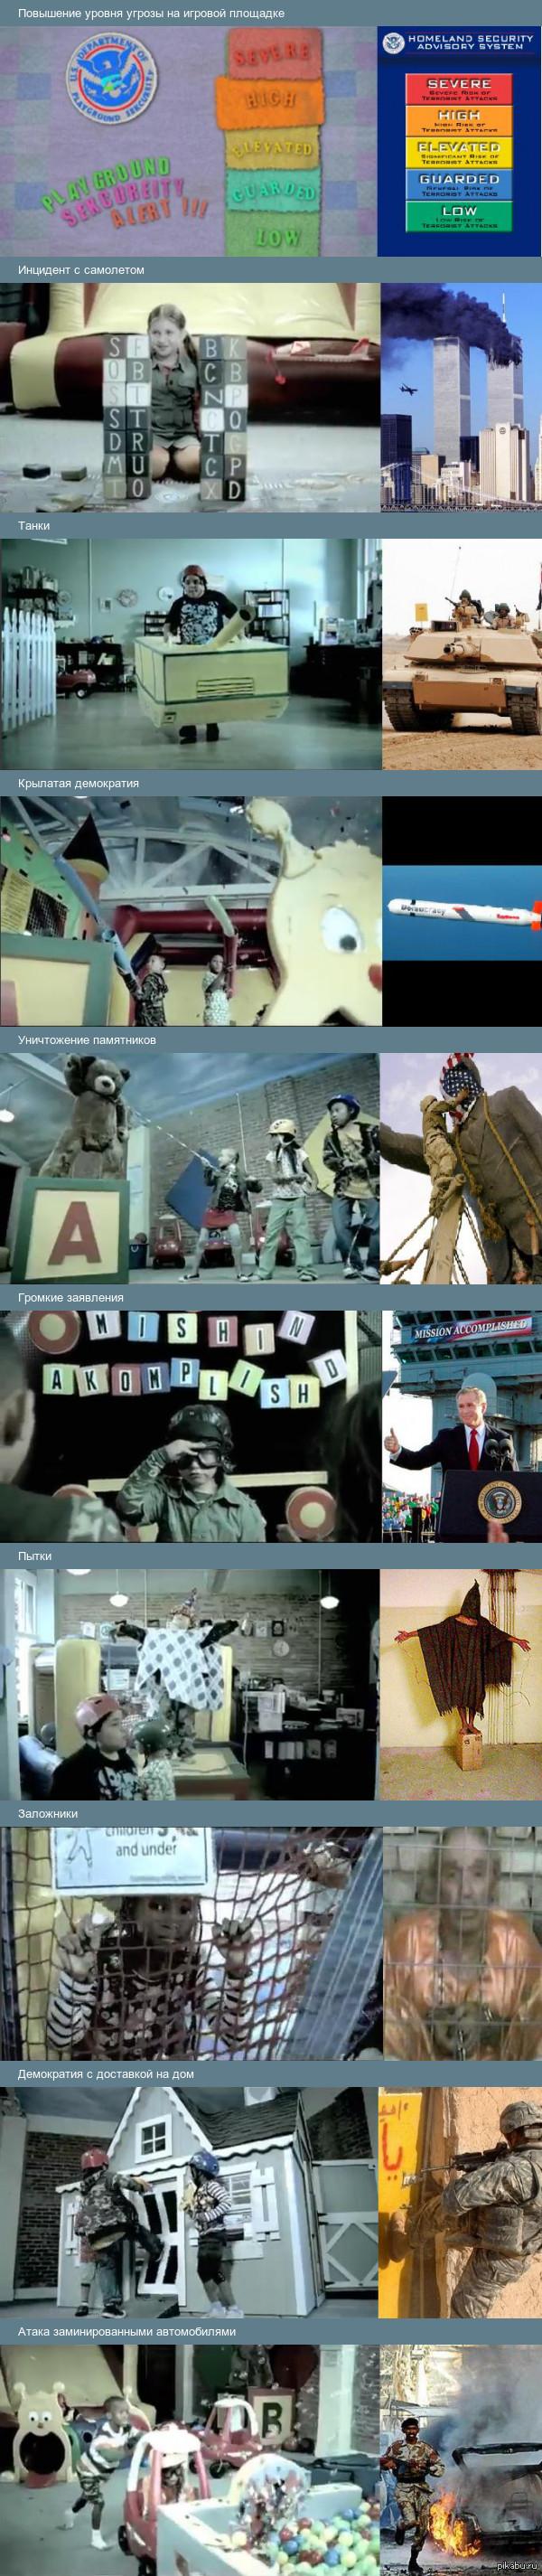 Видео клип Empty Walls и война в Ираке видео http://www.youtube.com/watch?v=-CxKA1uETxE